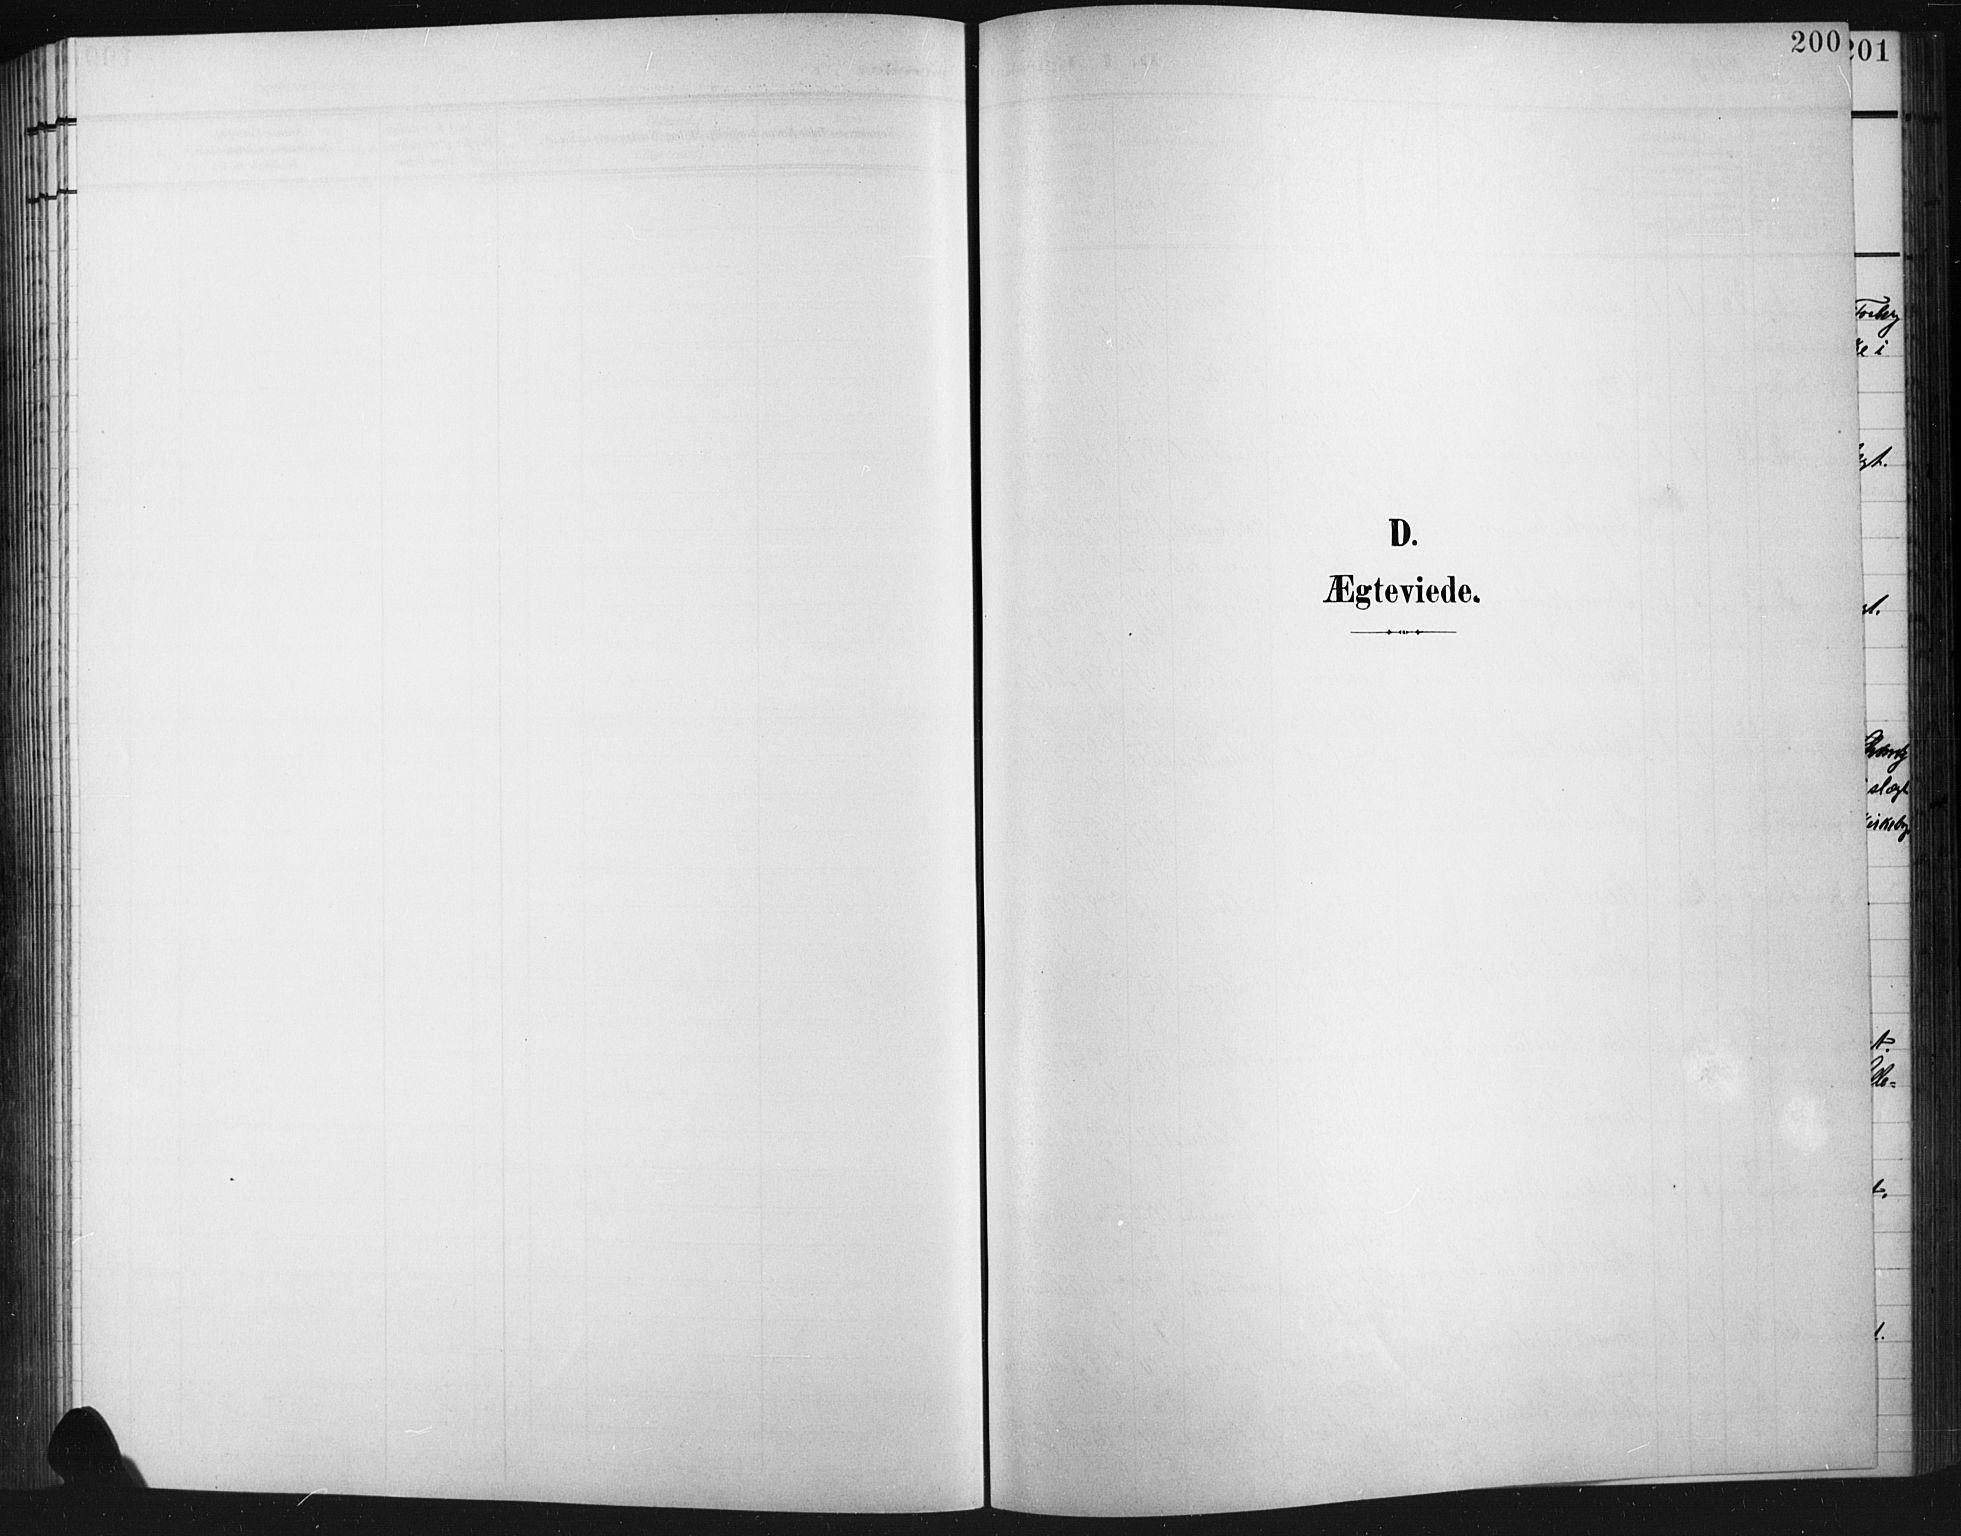 SAH, Fåberg prestekontor, H/Ha/Hab/L0012: Parish register (copy) no. 12, 1903-1924, p. 200